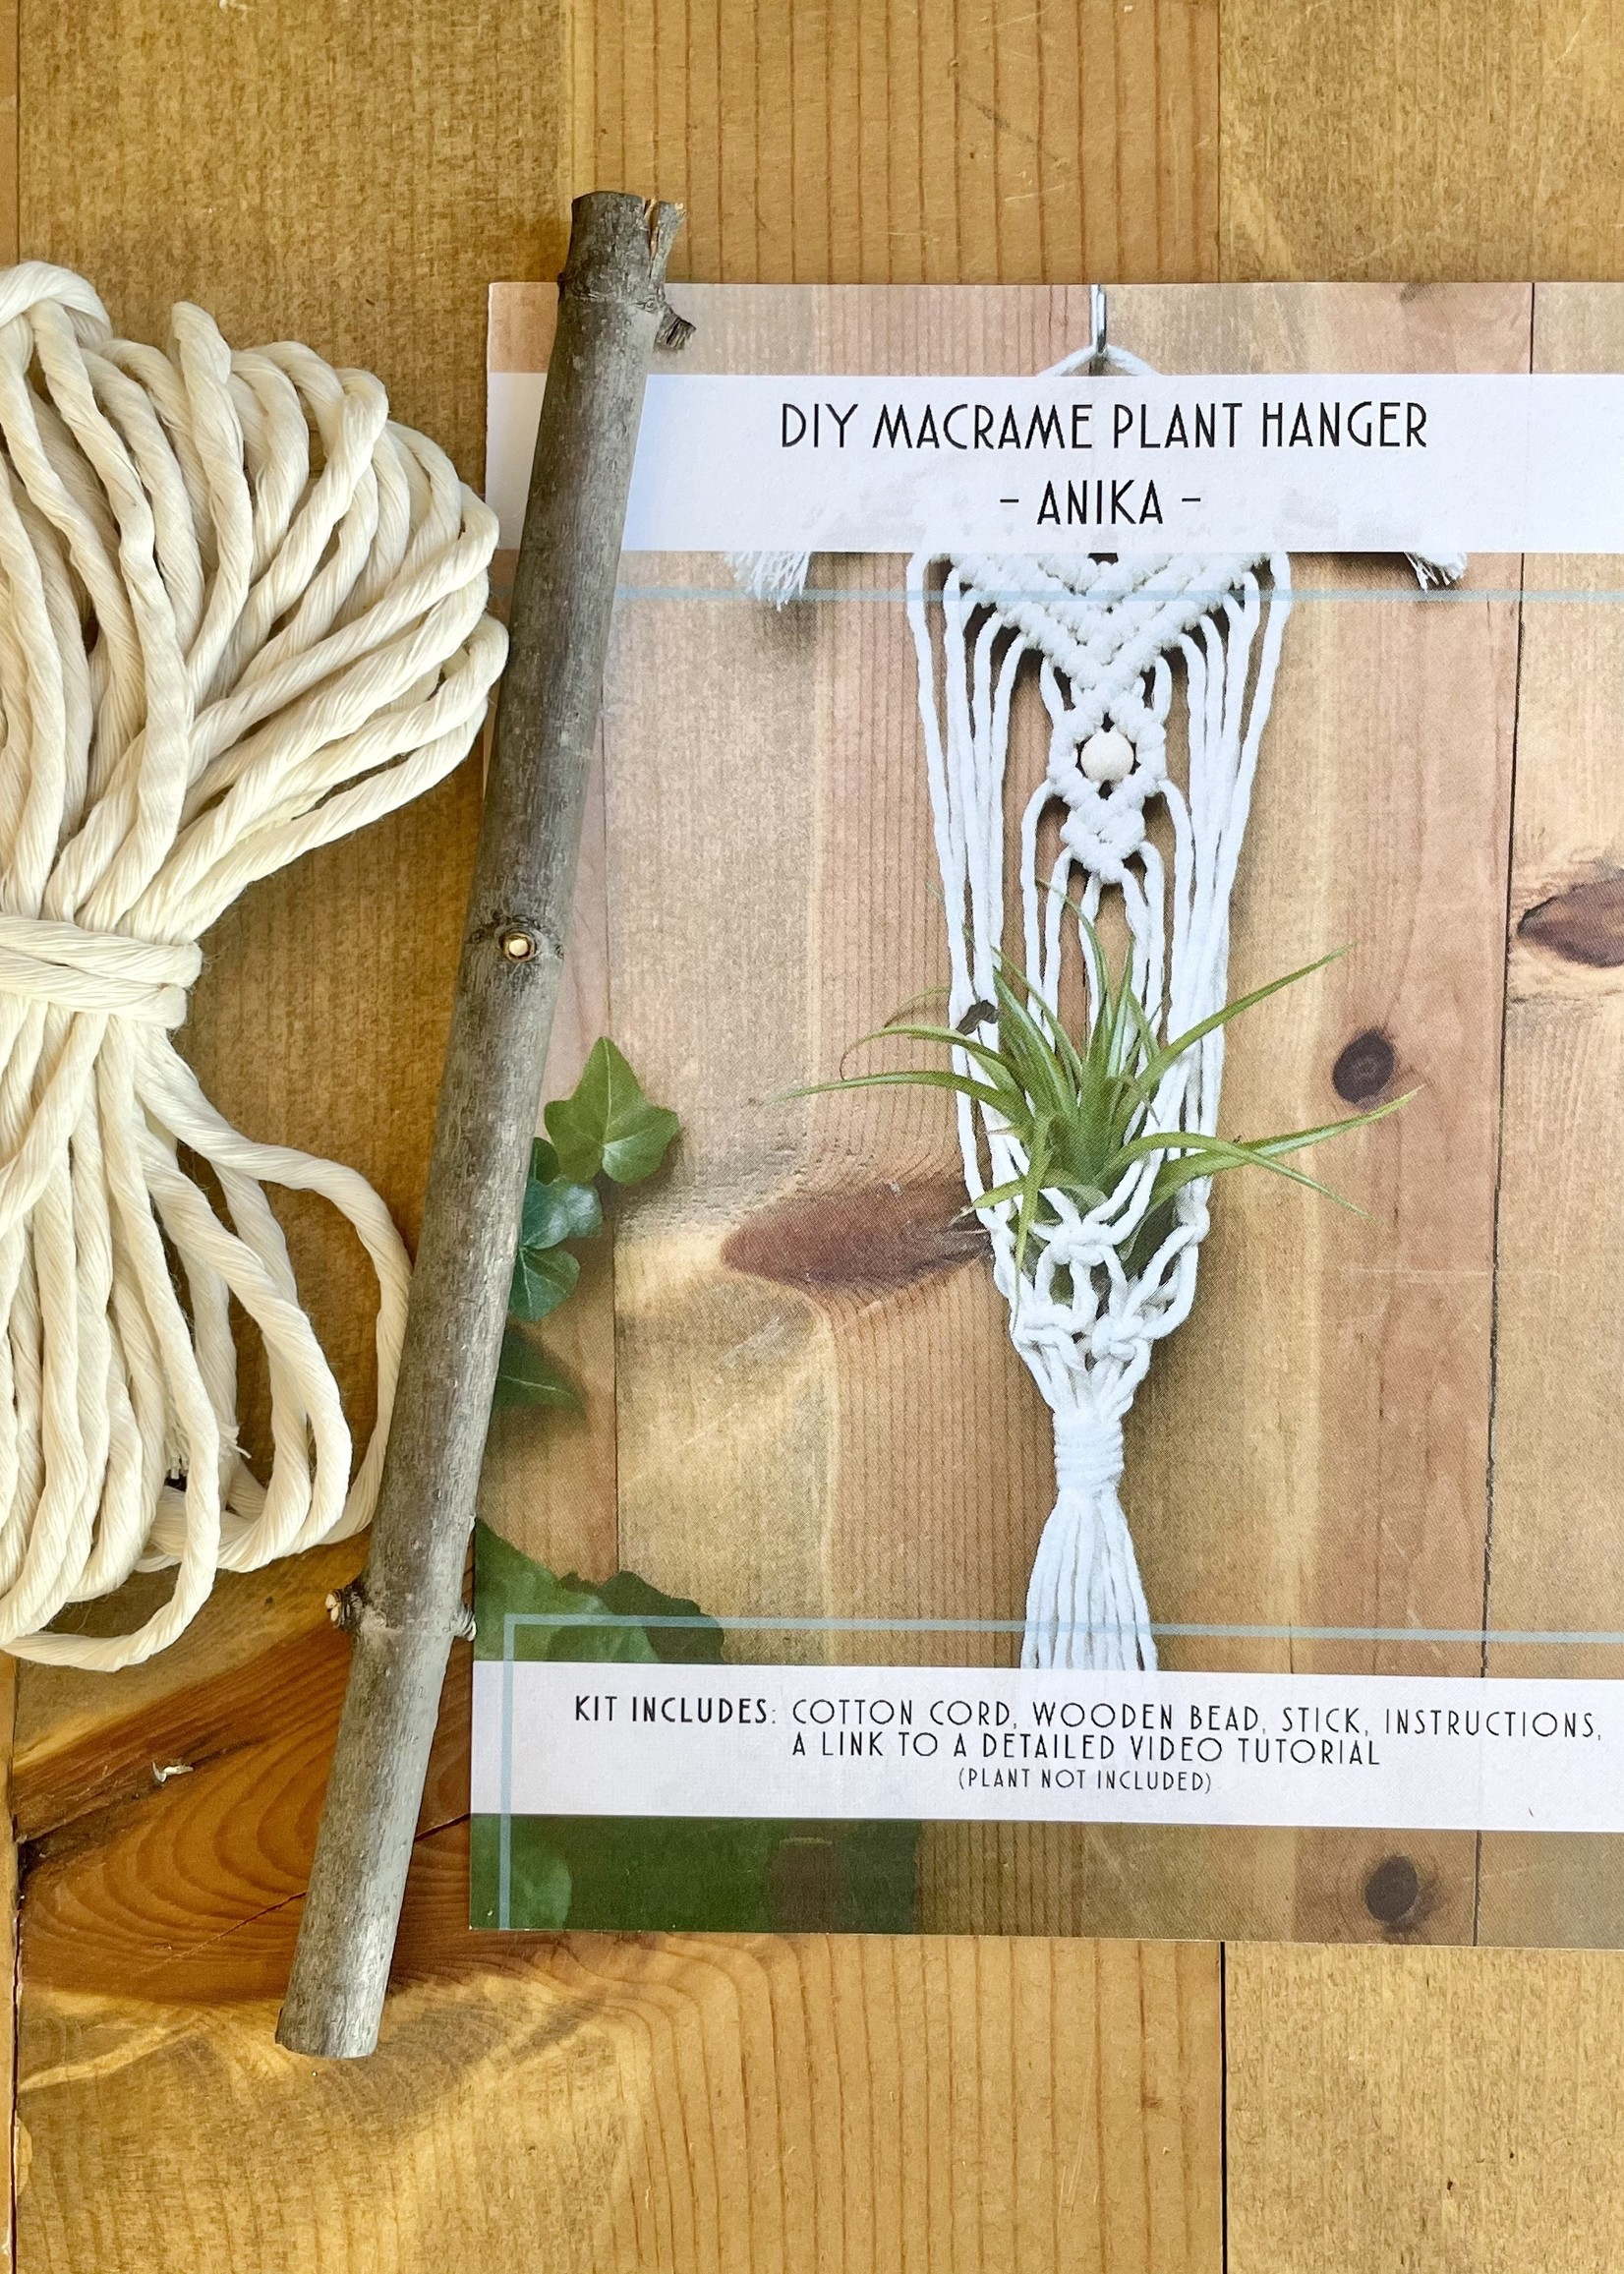 DIY Macrame Air Plant Hanger Kit - The Anika